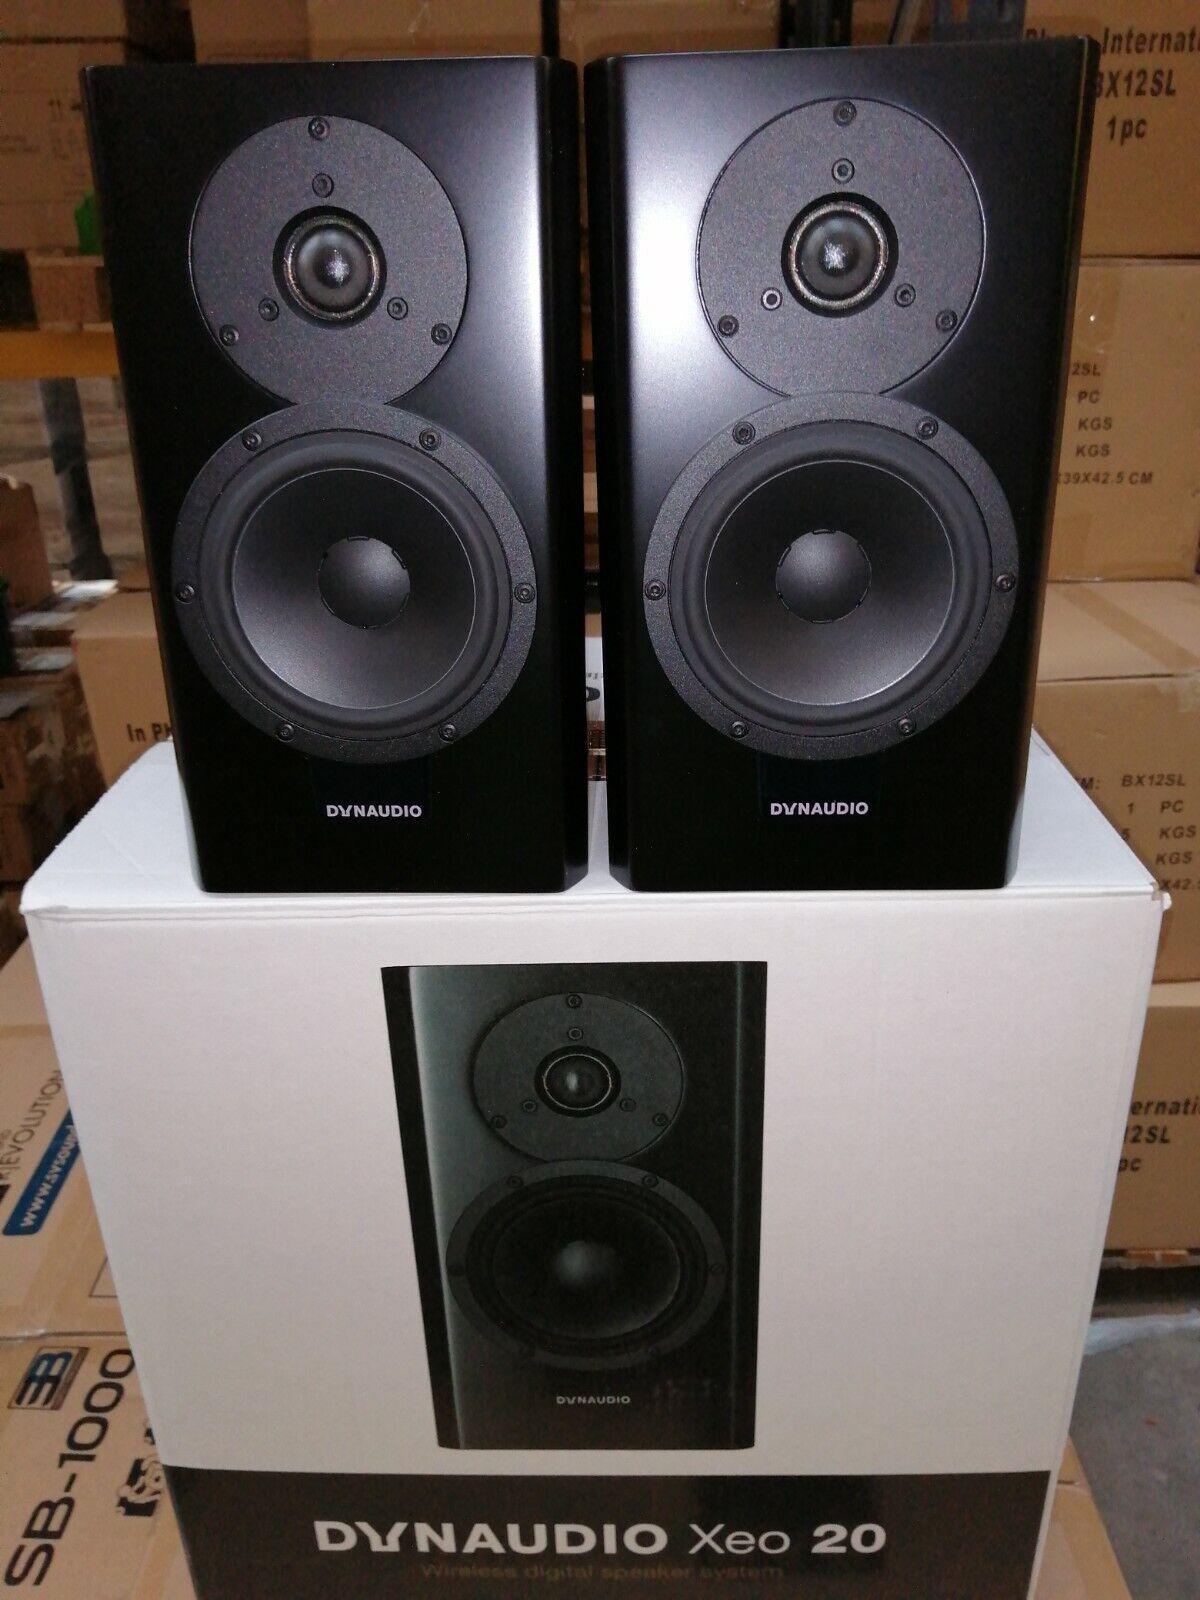 Dynaudio Xeo 20 Black Active Speakers - Ex-Demonstration